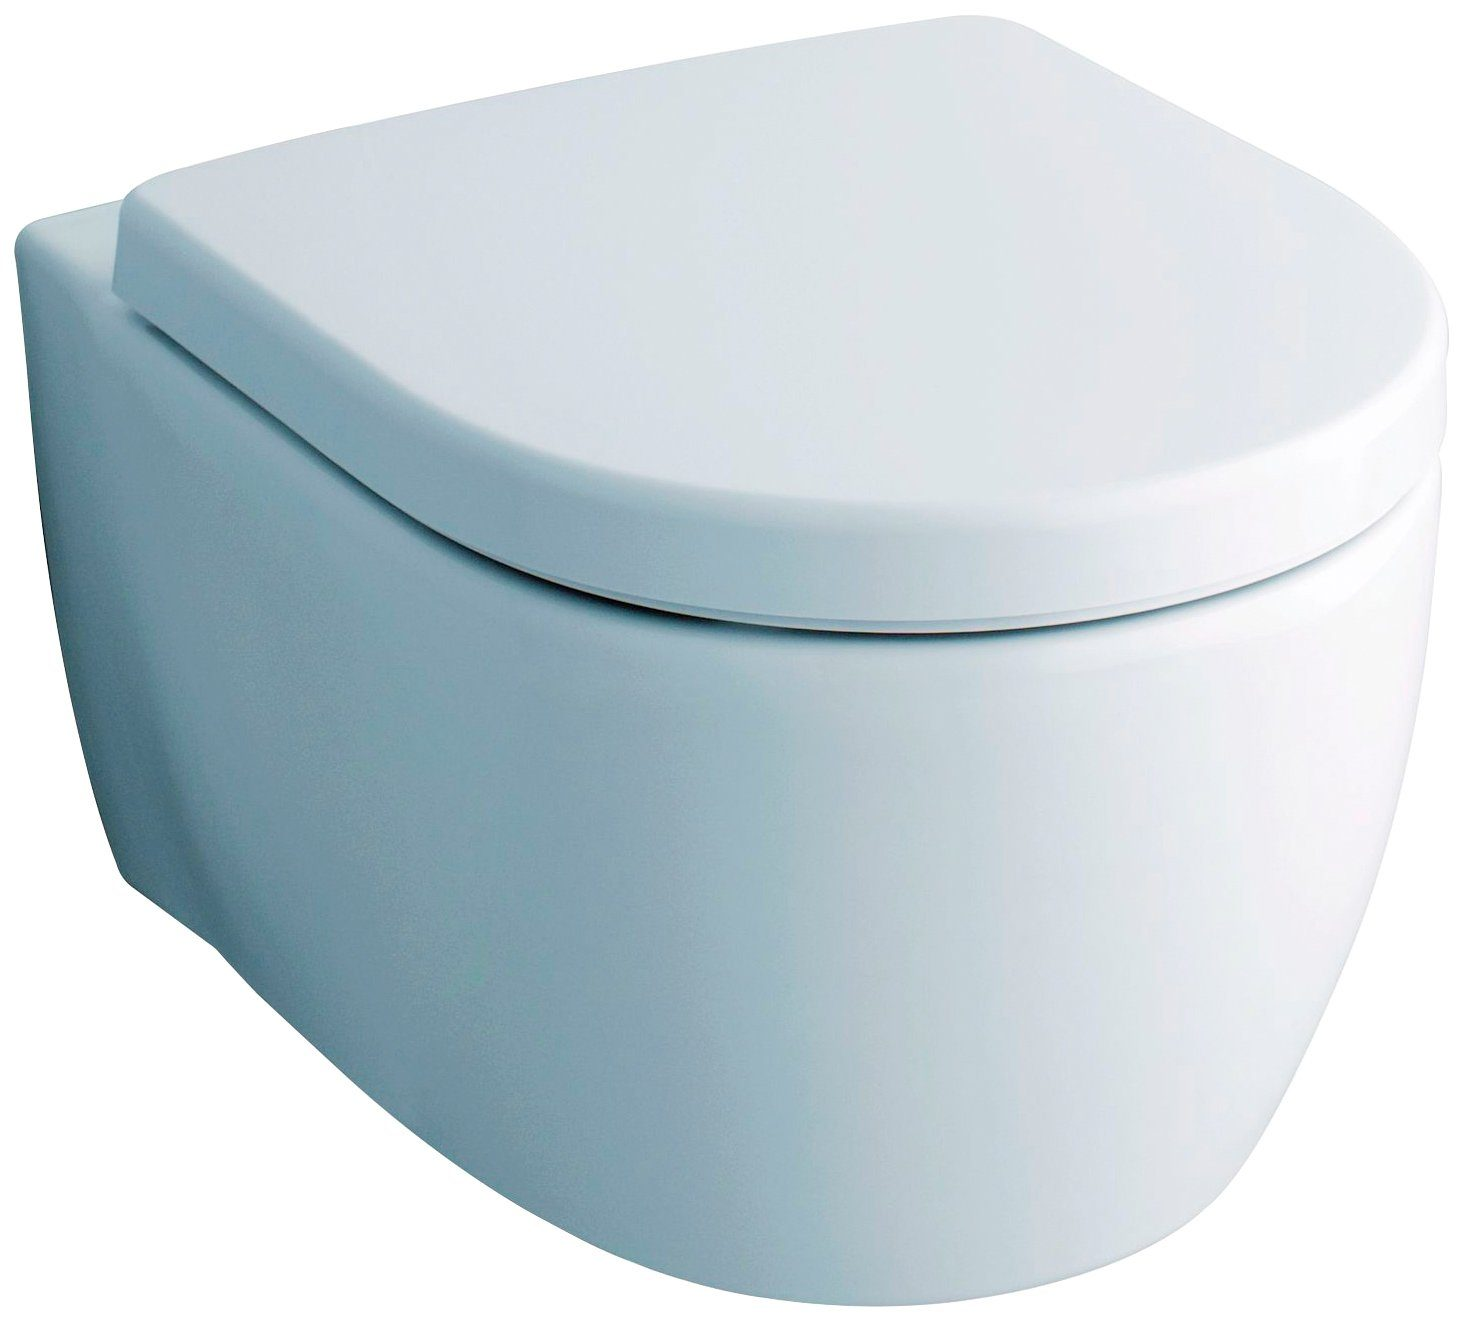 KERAMAG WC-Sitz »iCon«